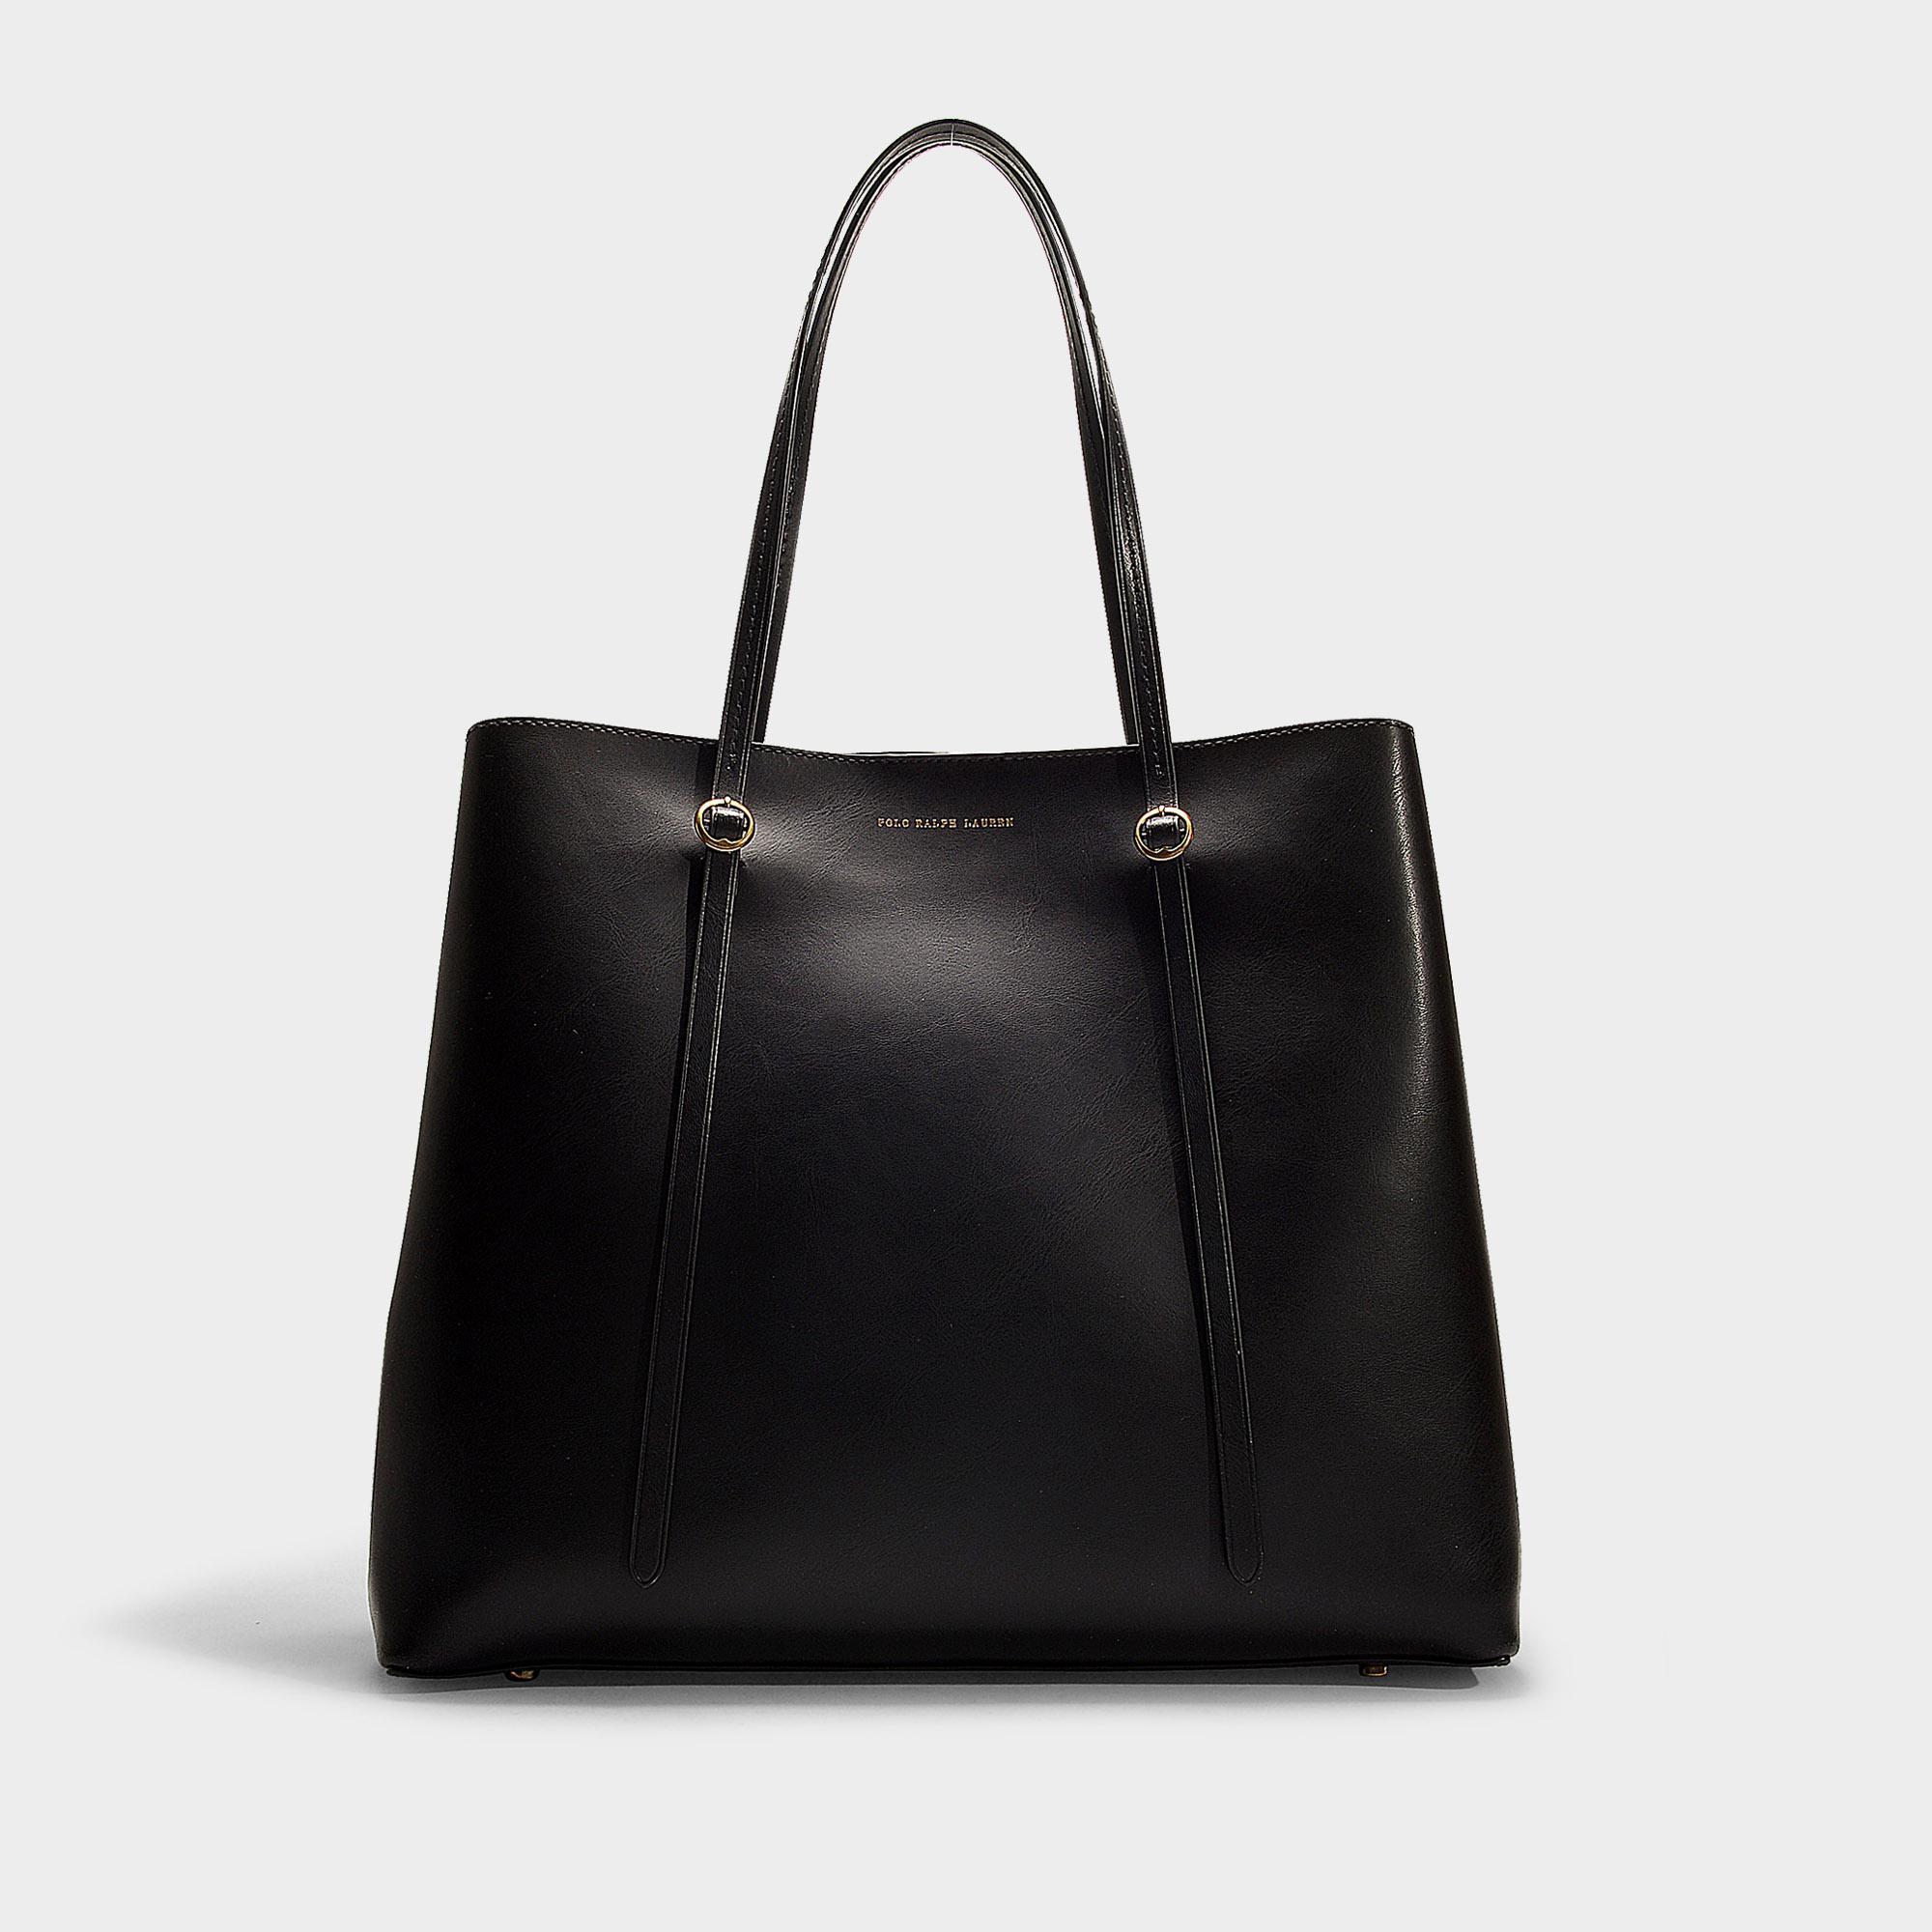 a95ab394b2 Polo Ralph Lauren Big Lennox Tote Bag In Black Calfskin in Black ...